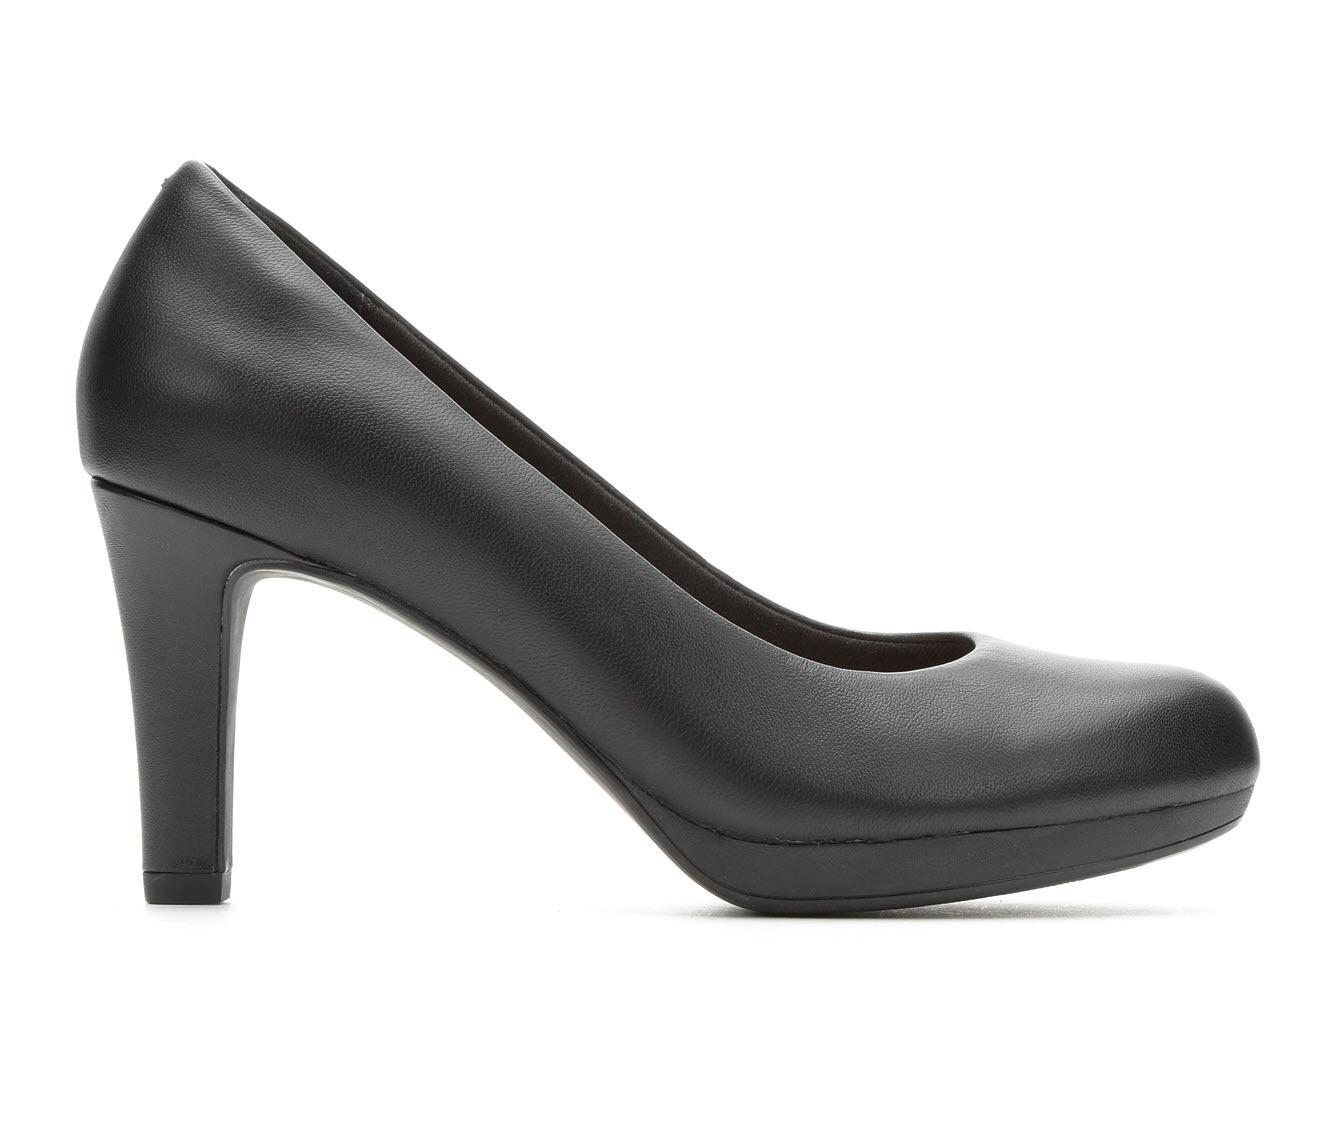 Clarks Adriel Viola Women's Dress Shoe (Black Leather)